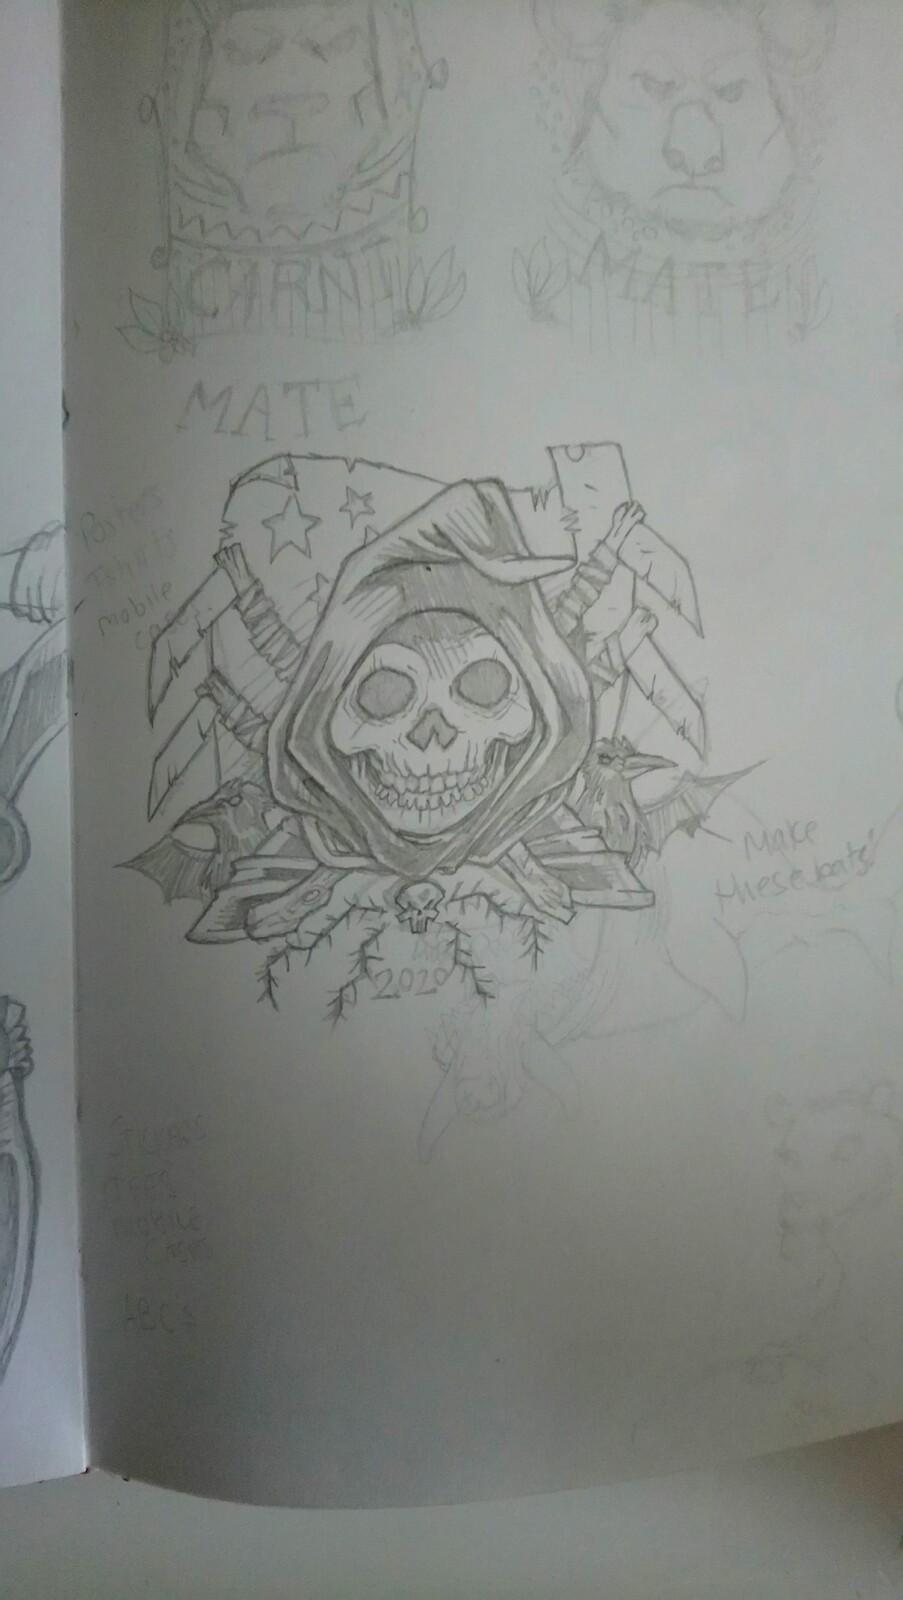 Initial sketch - doodle